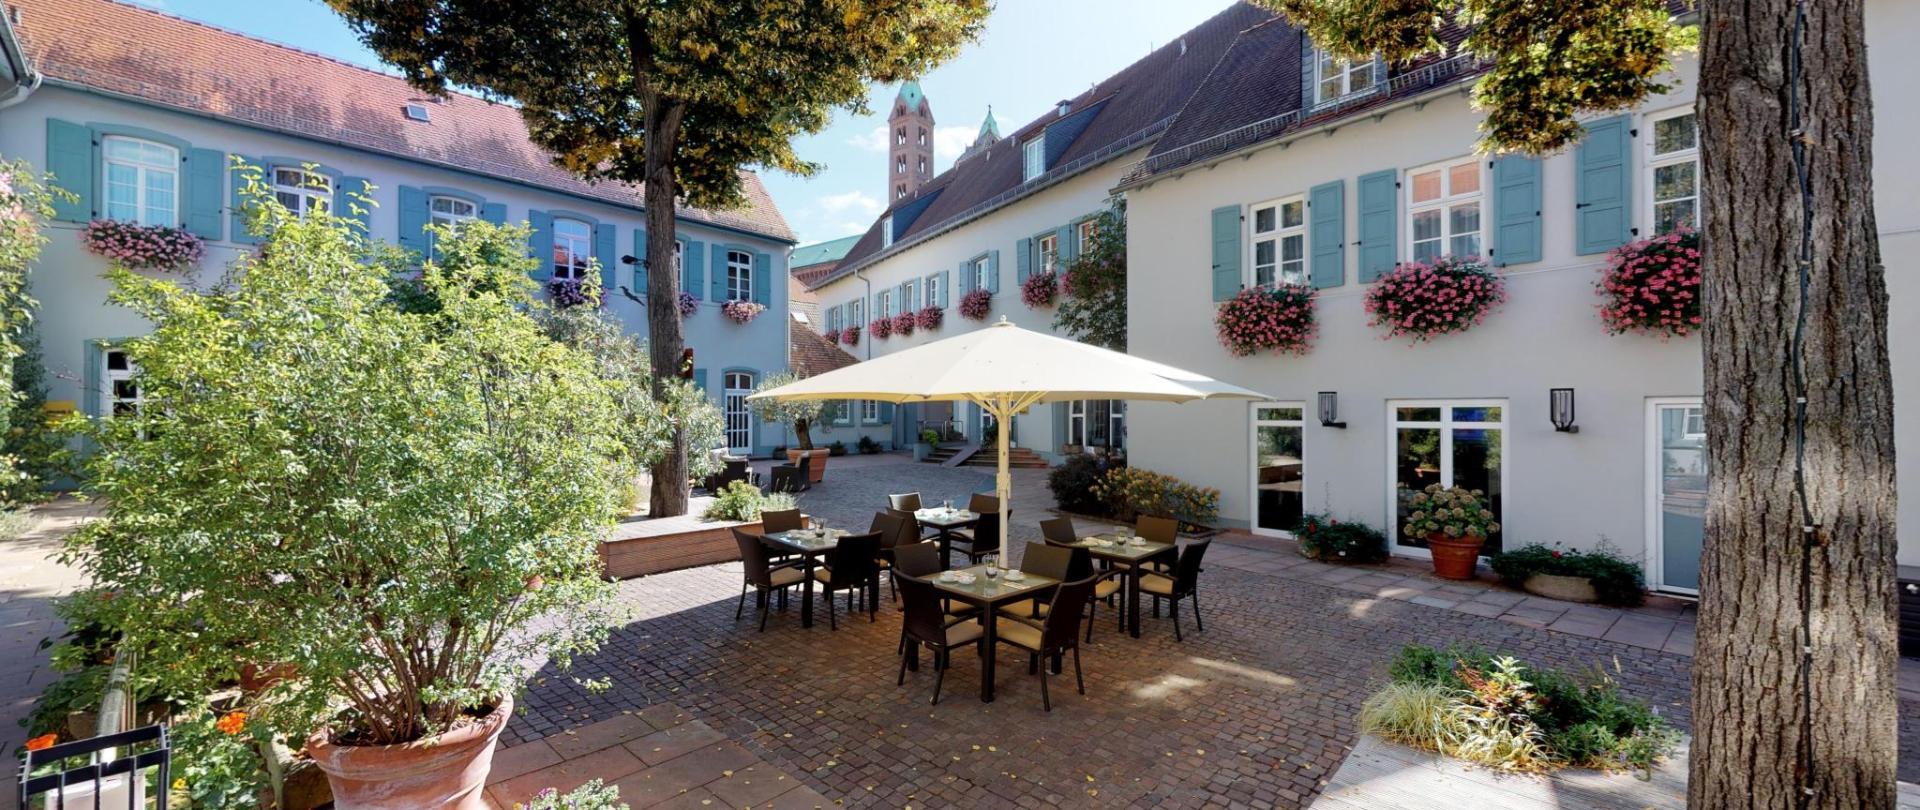 Hotel-Domhof-175017.jpg